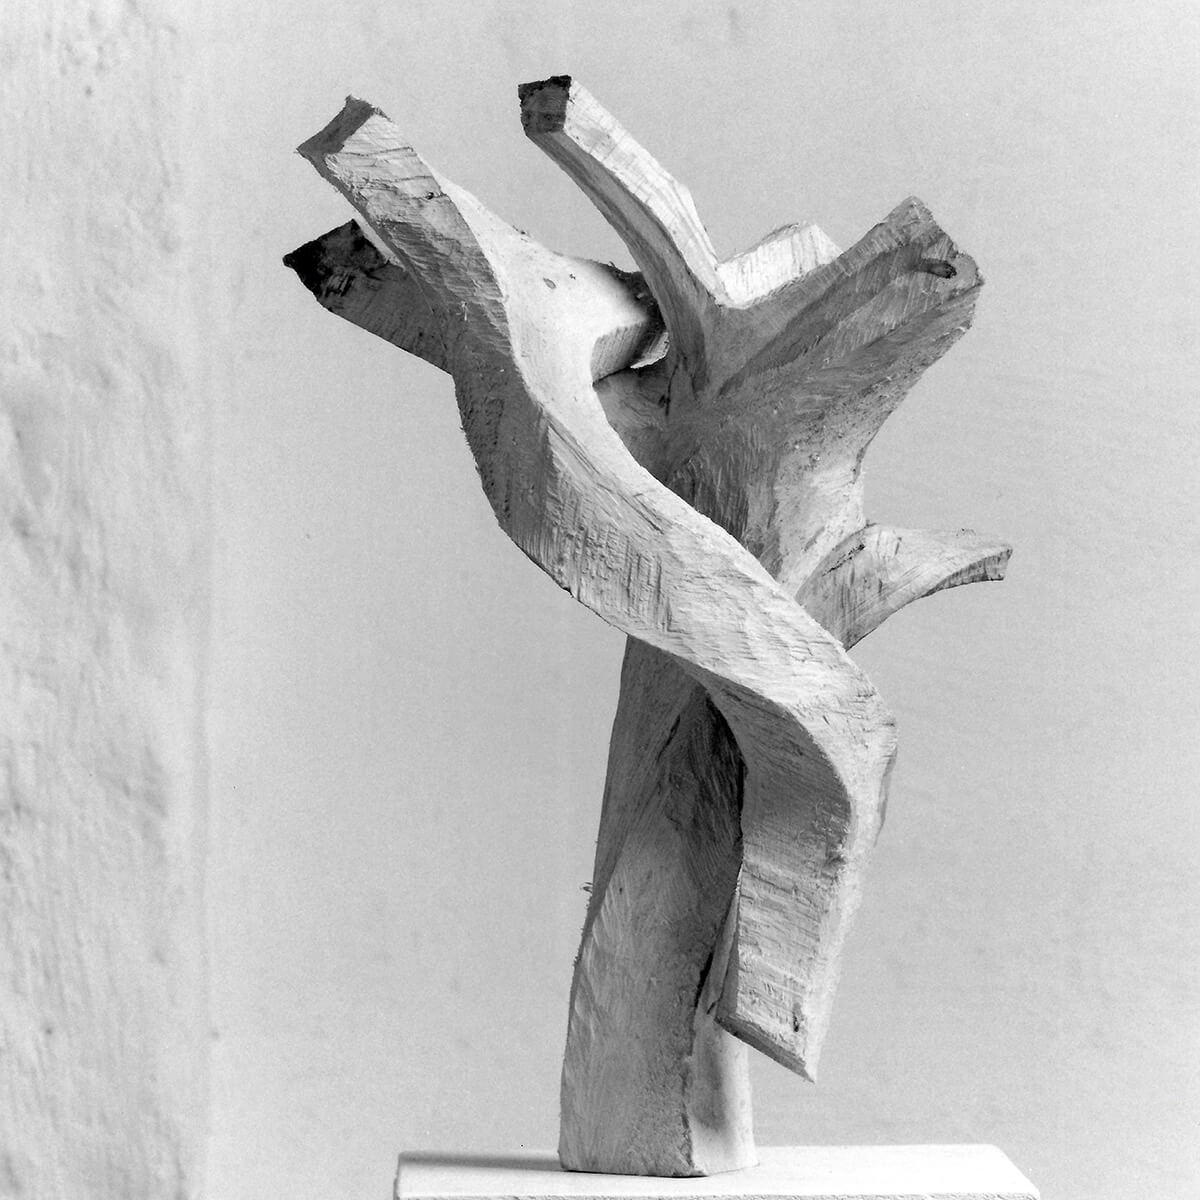 Bildhauer OMI Riesterer Skulpturen Werkgruppe 1 Holz als Formgeber